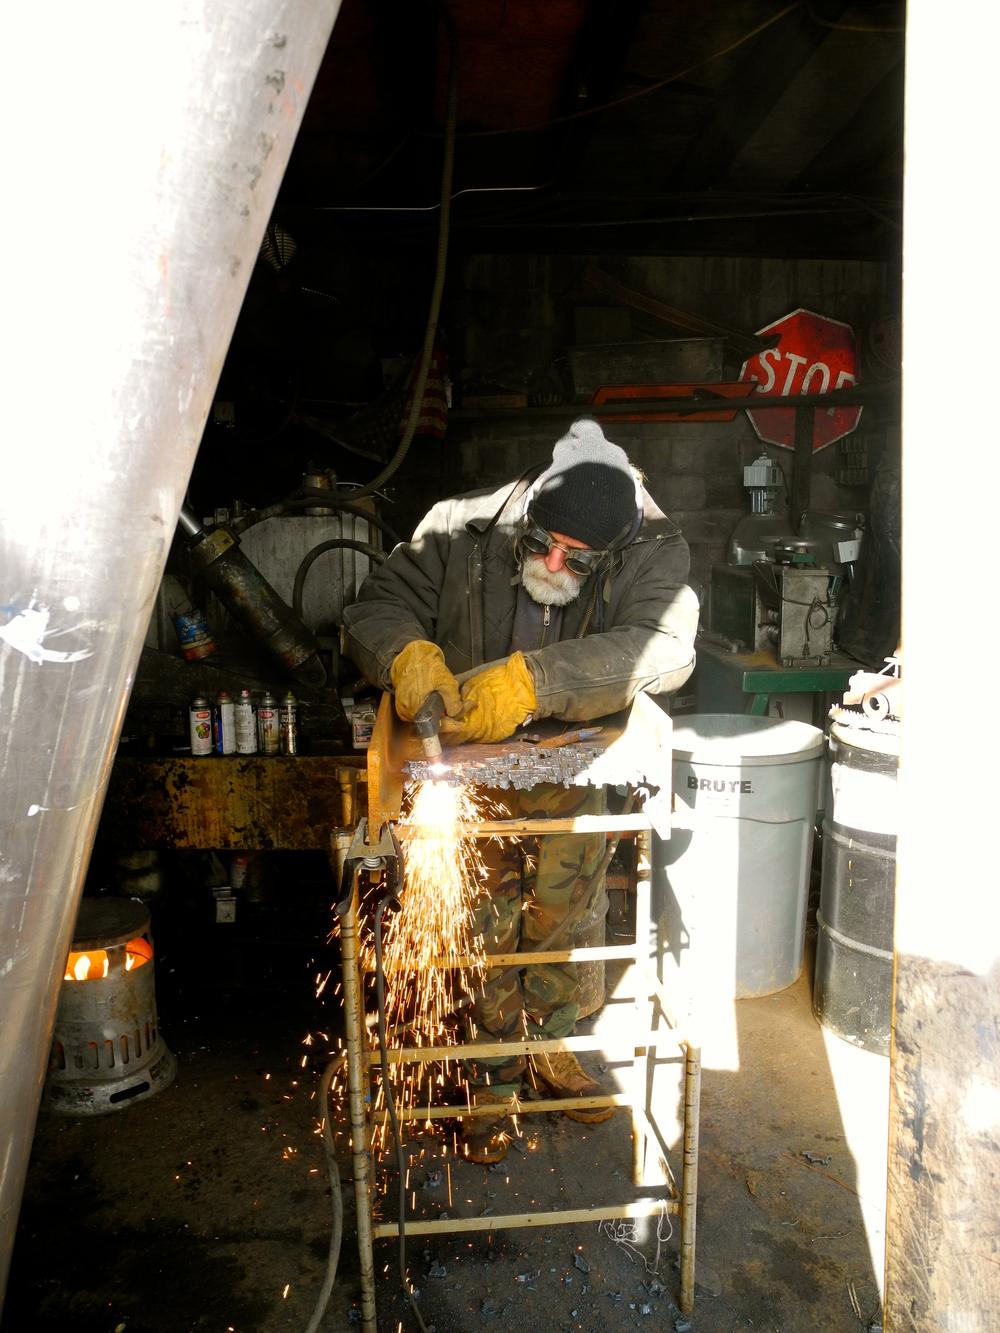 Richard in his junk yard studio.